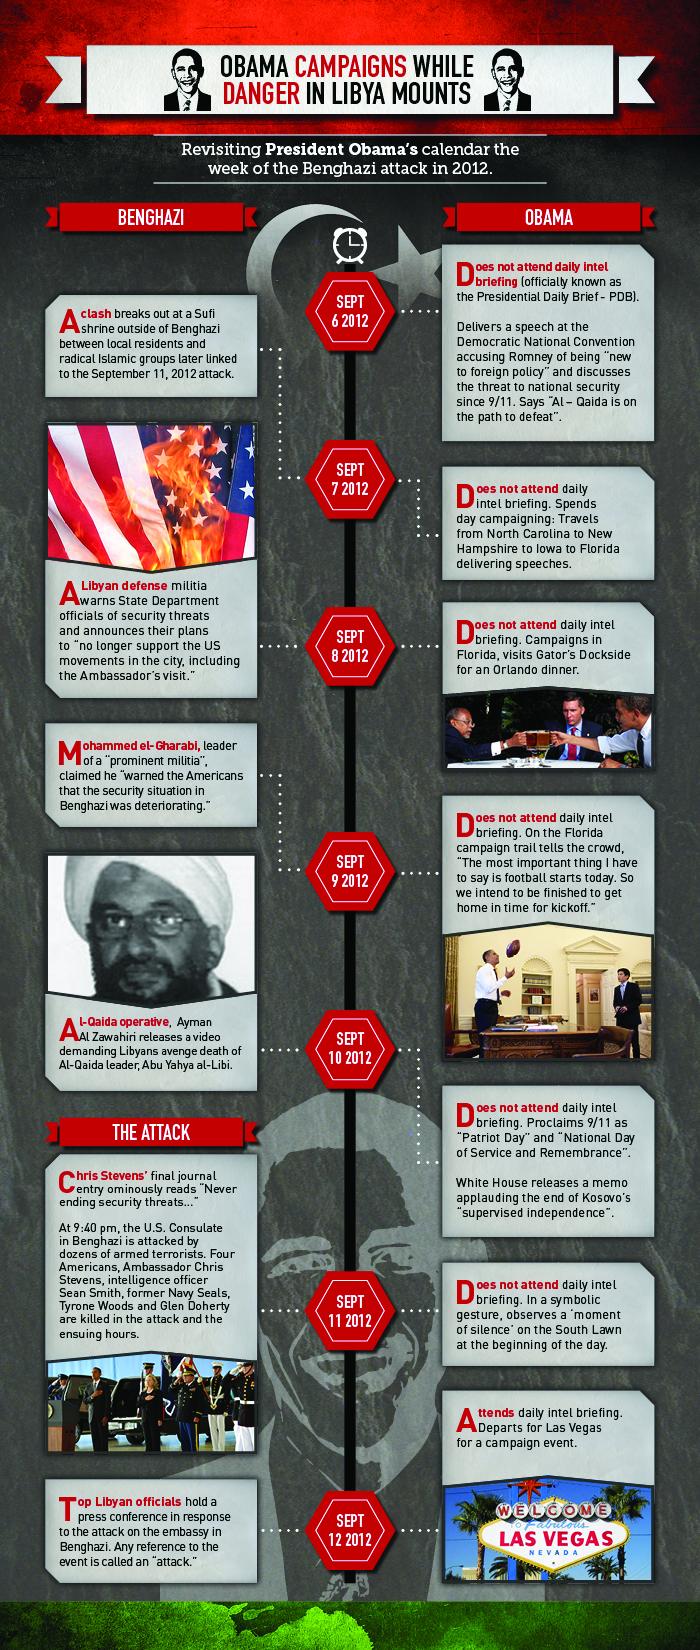 14-0119 - Breitbart Timeline Benghazi